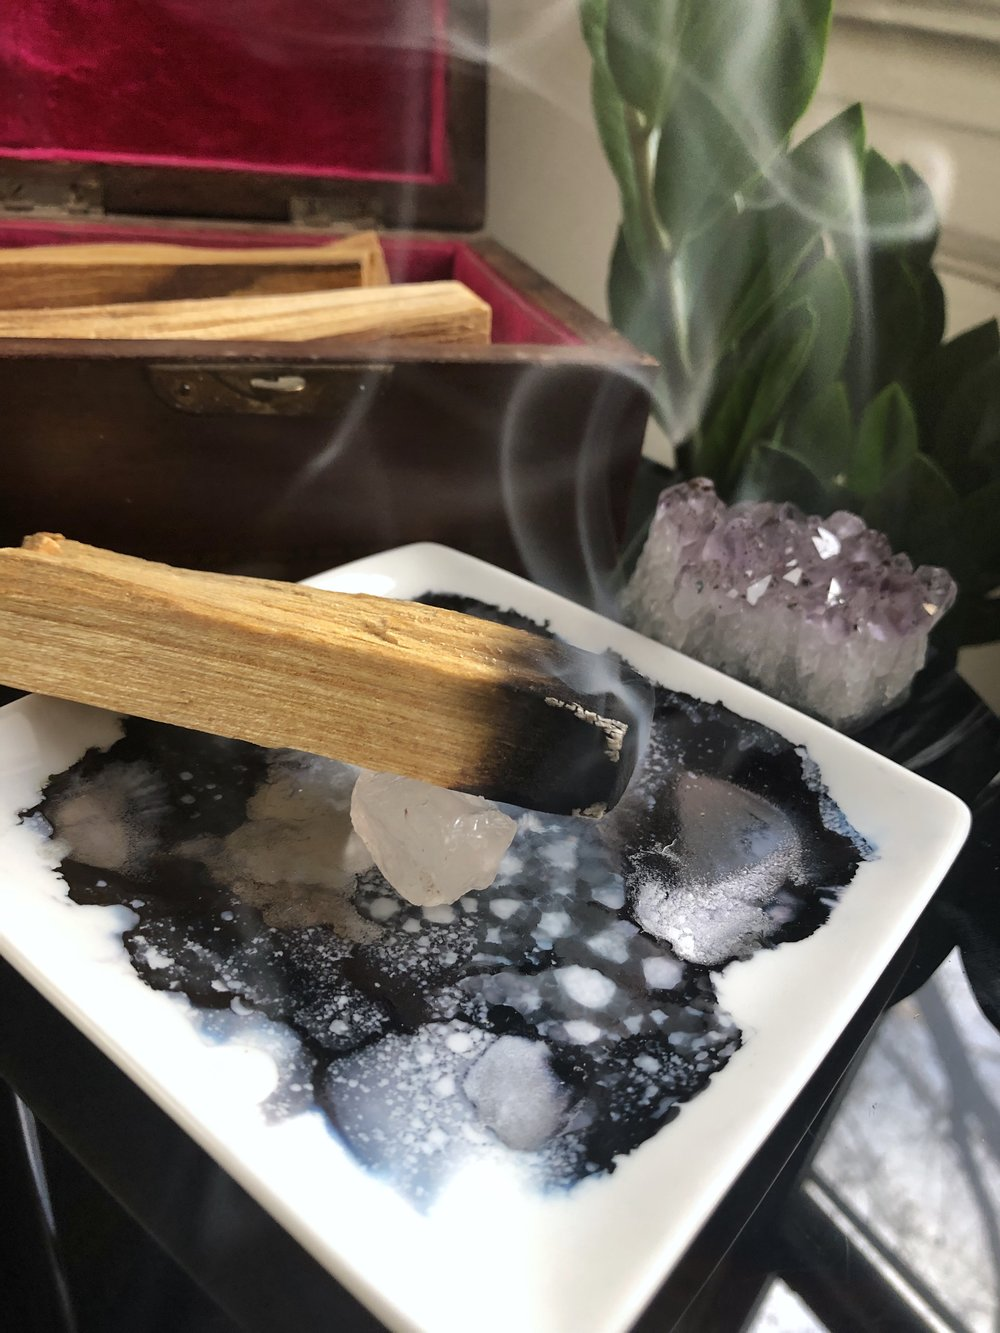 DIY Palo Santo Alcohol Ink Tray #hippiecraft #crystals #smudging #smudgestick #craftstodowhenyourbored